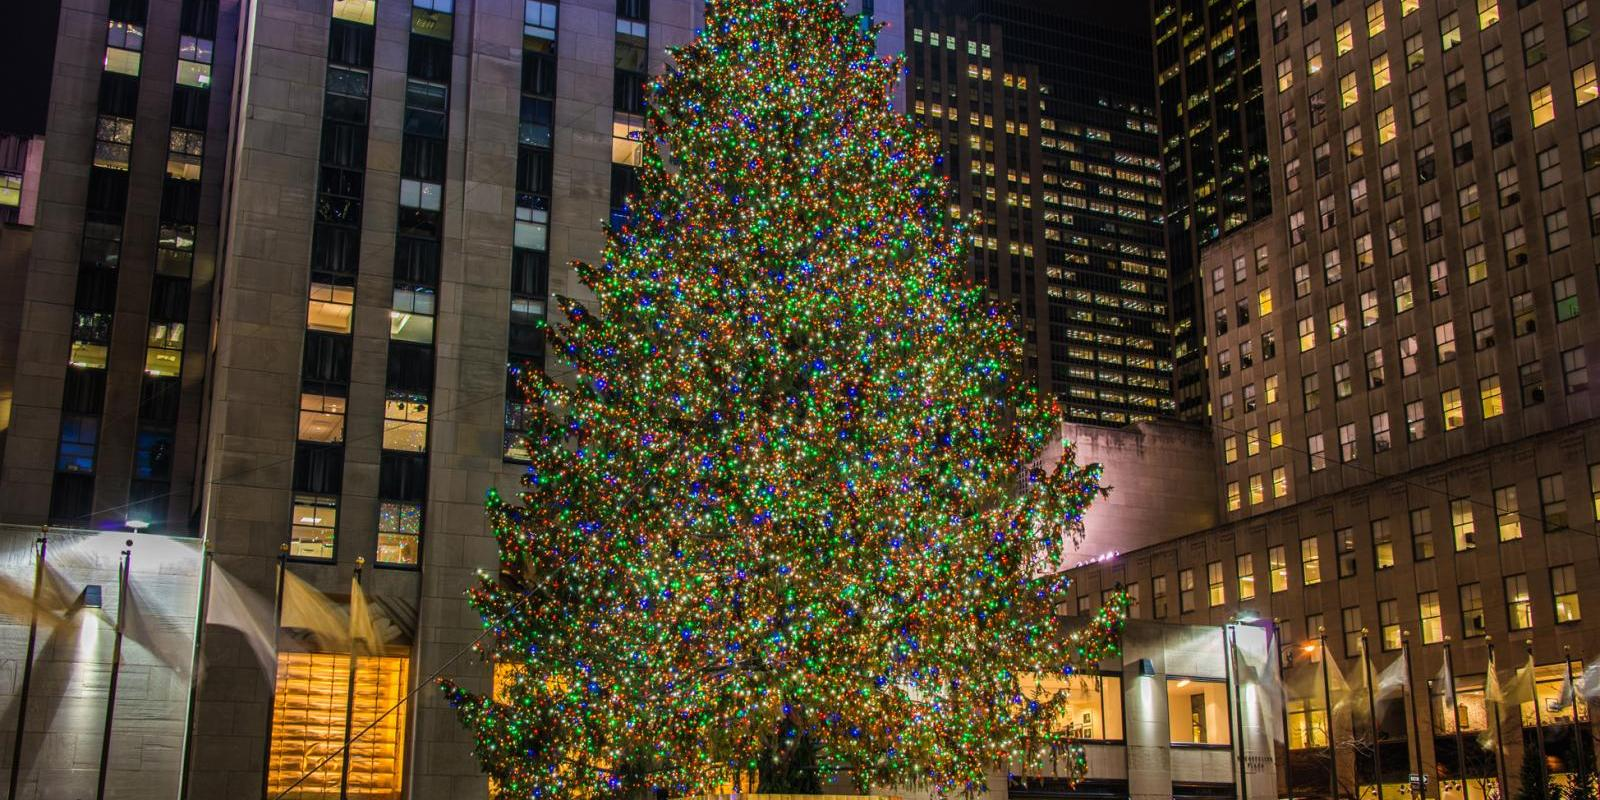 Nyc Christmas Tree Lighting 2019.The Christmas Tree At Rockefeller Center 2019 A New